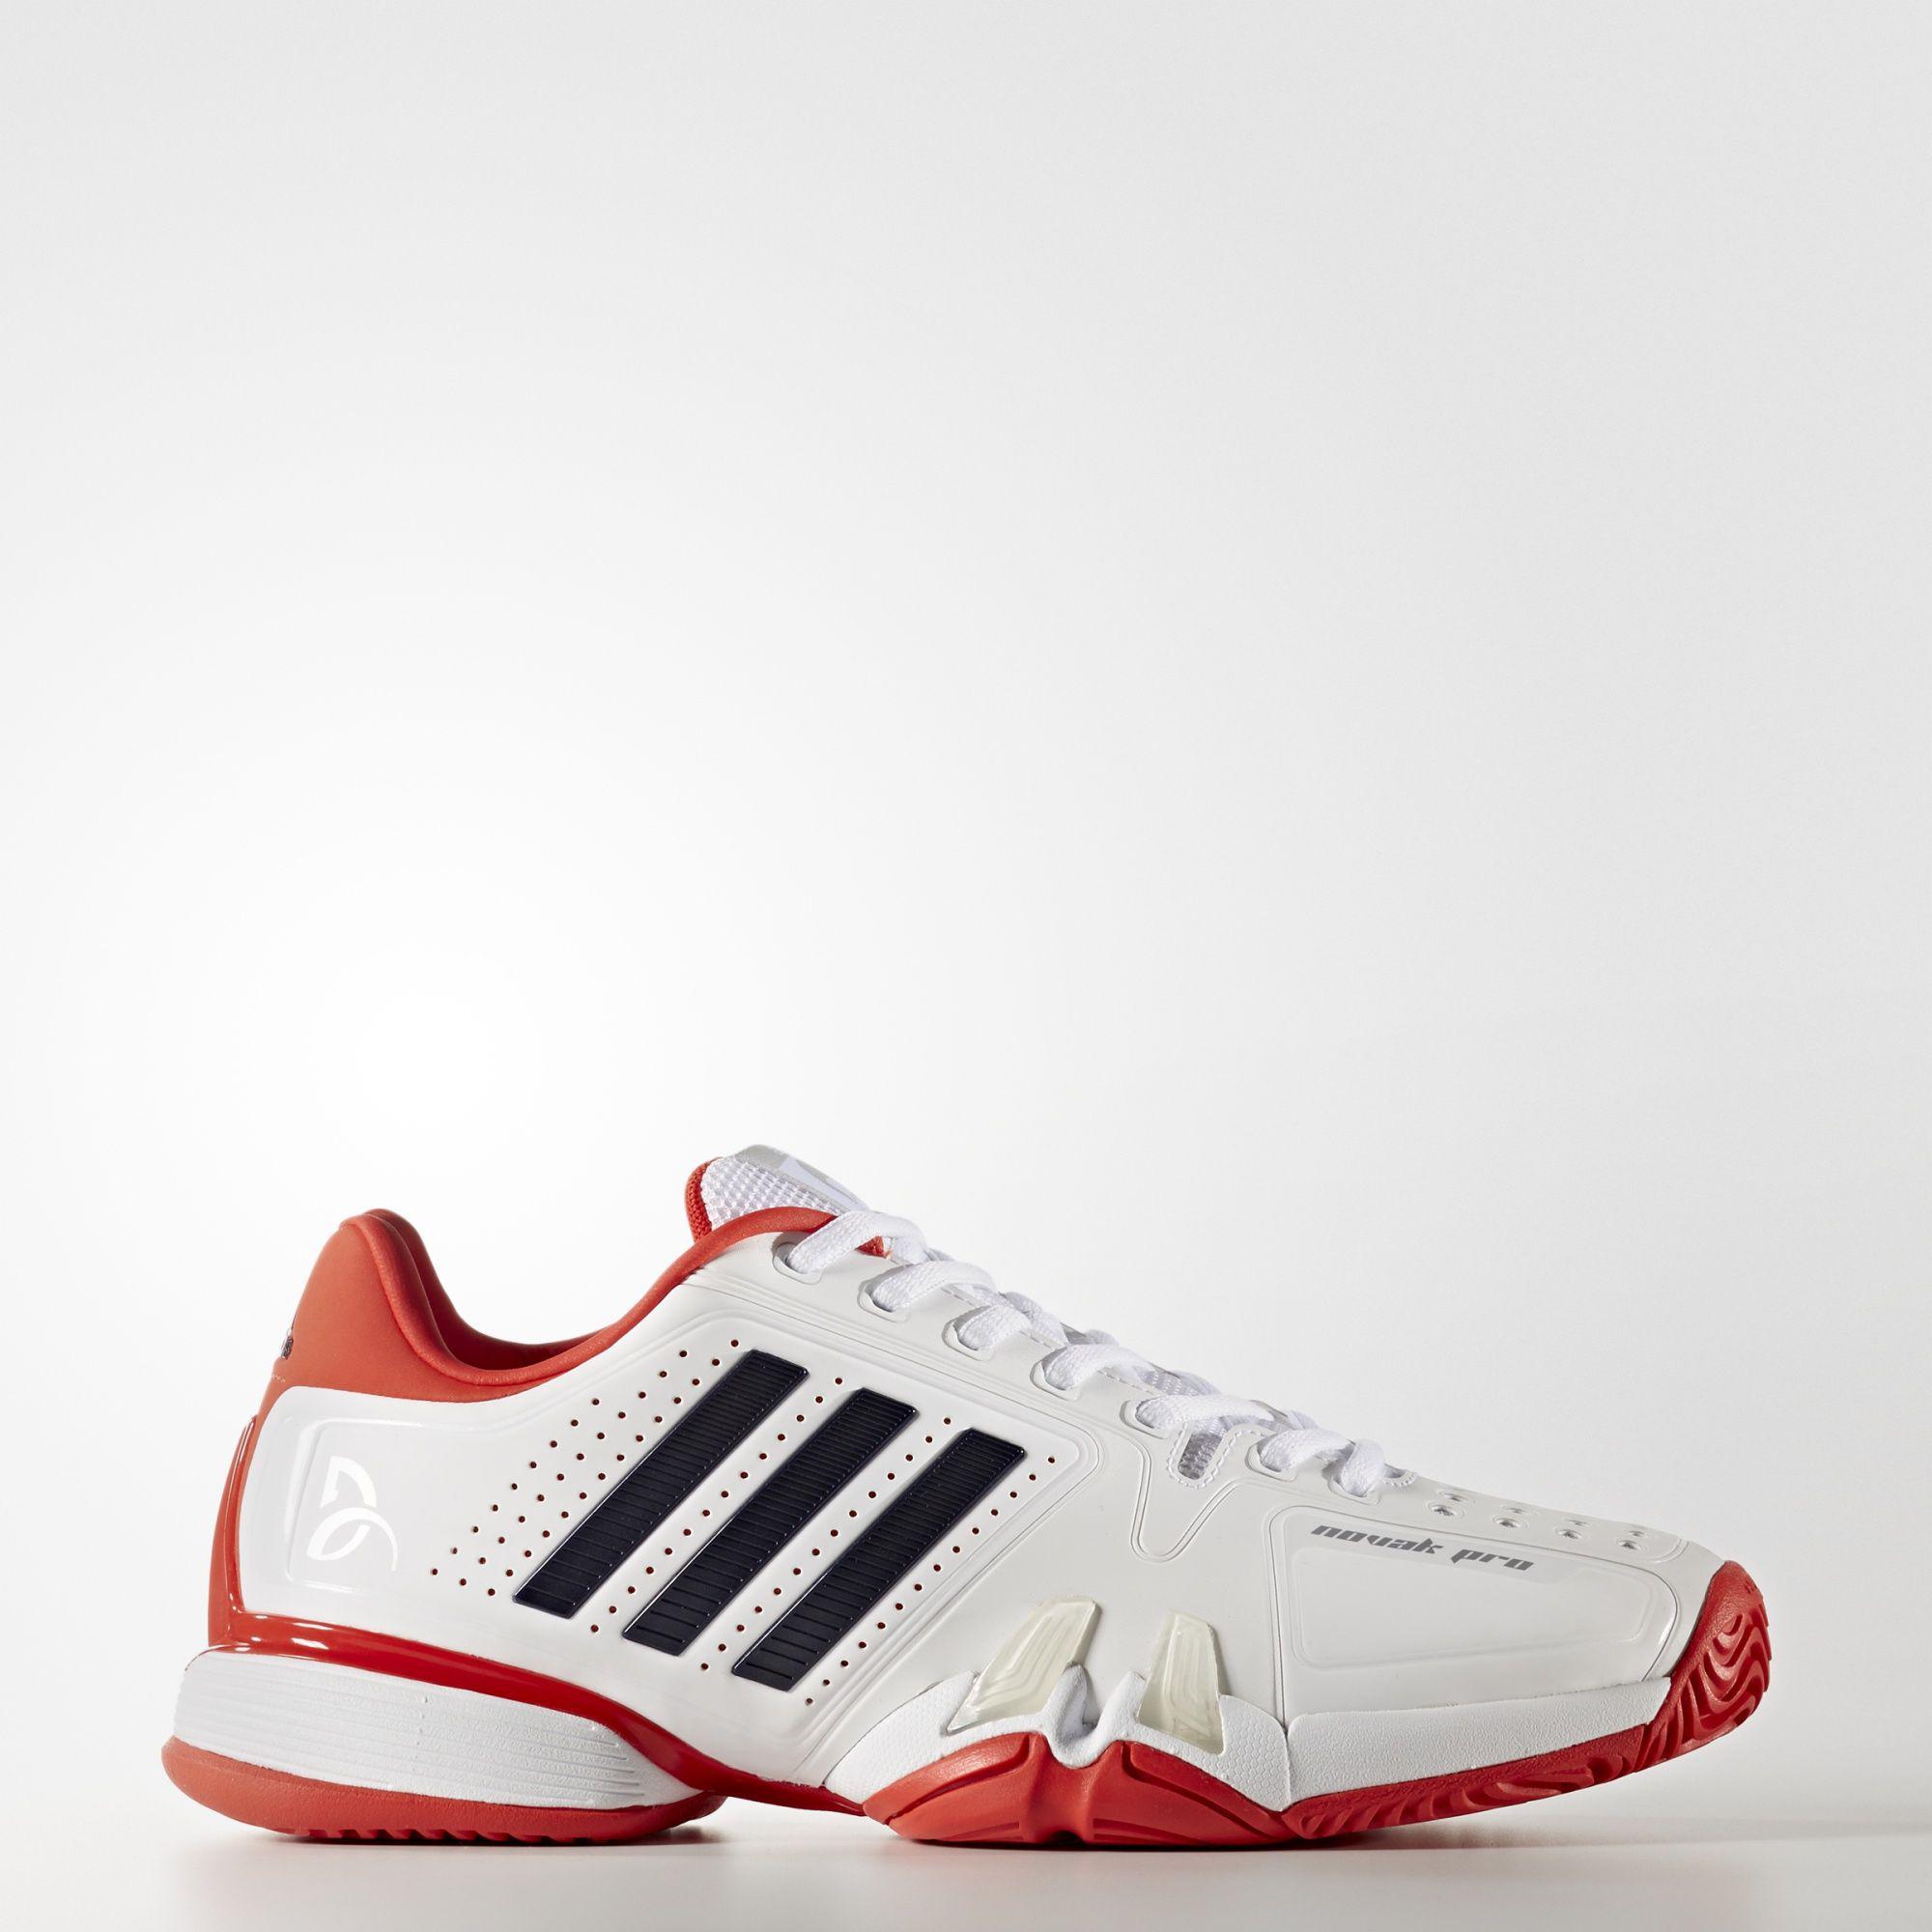 best website 7abbc ad6bd Adidas Mens Novak Pro Barricade Tennis Shoes - WhiteRed - Tennisnuts.com